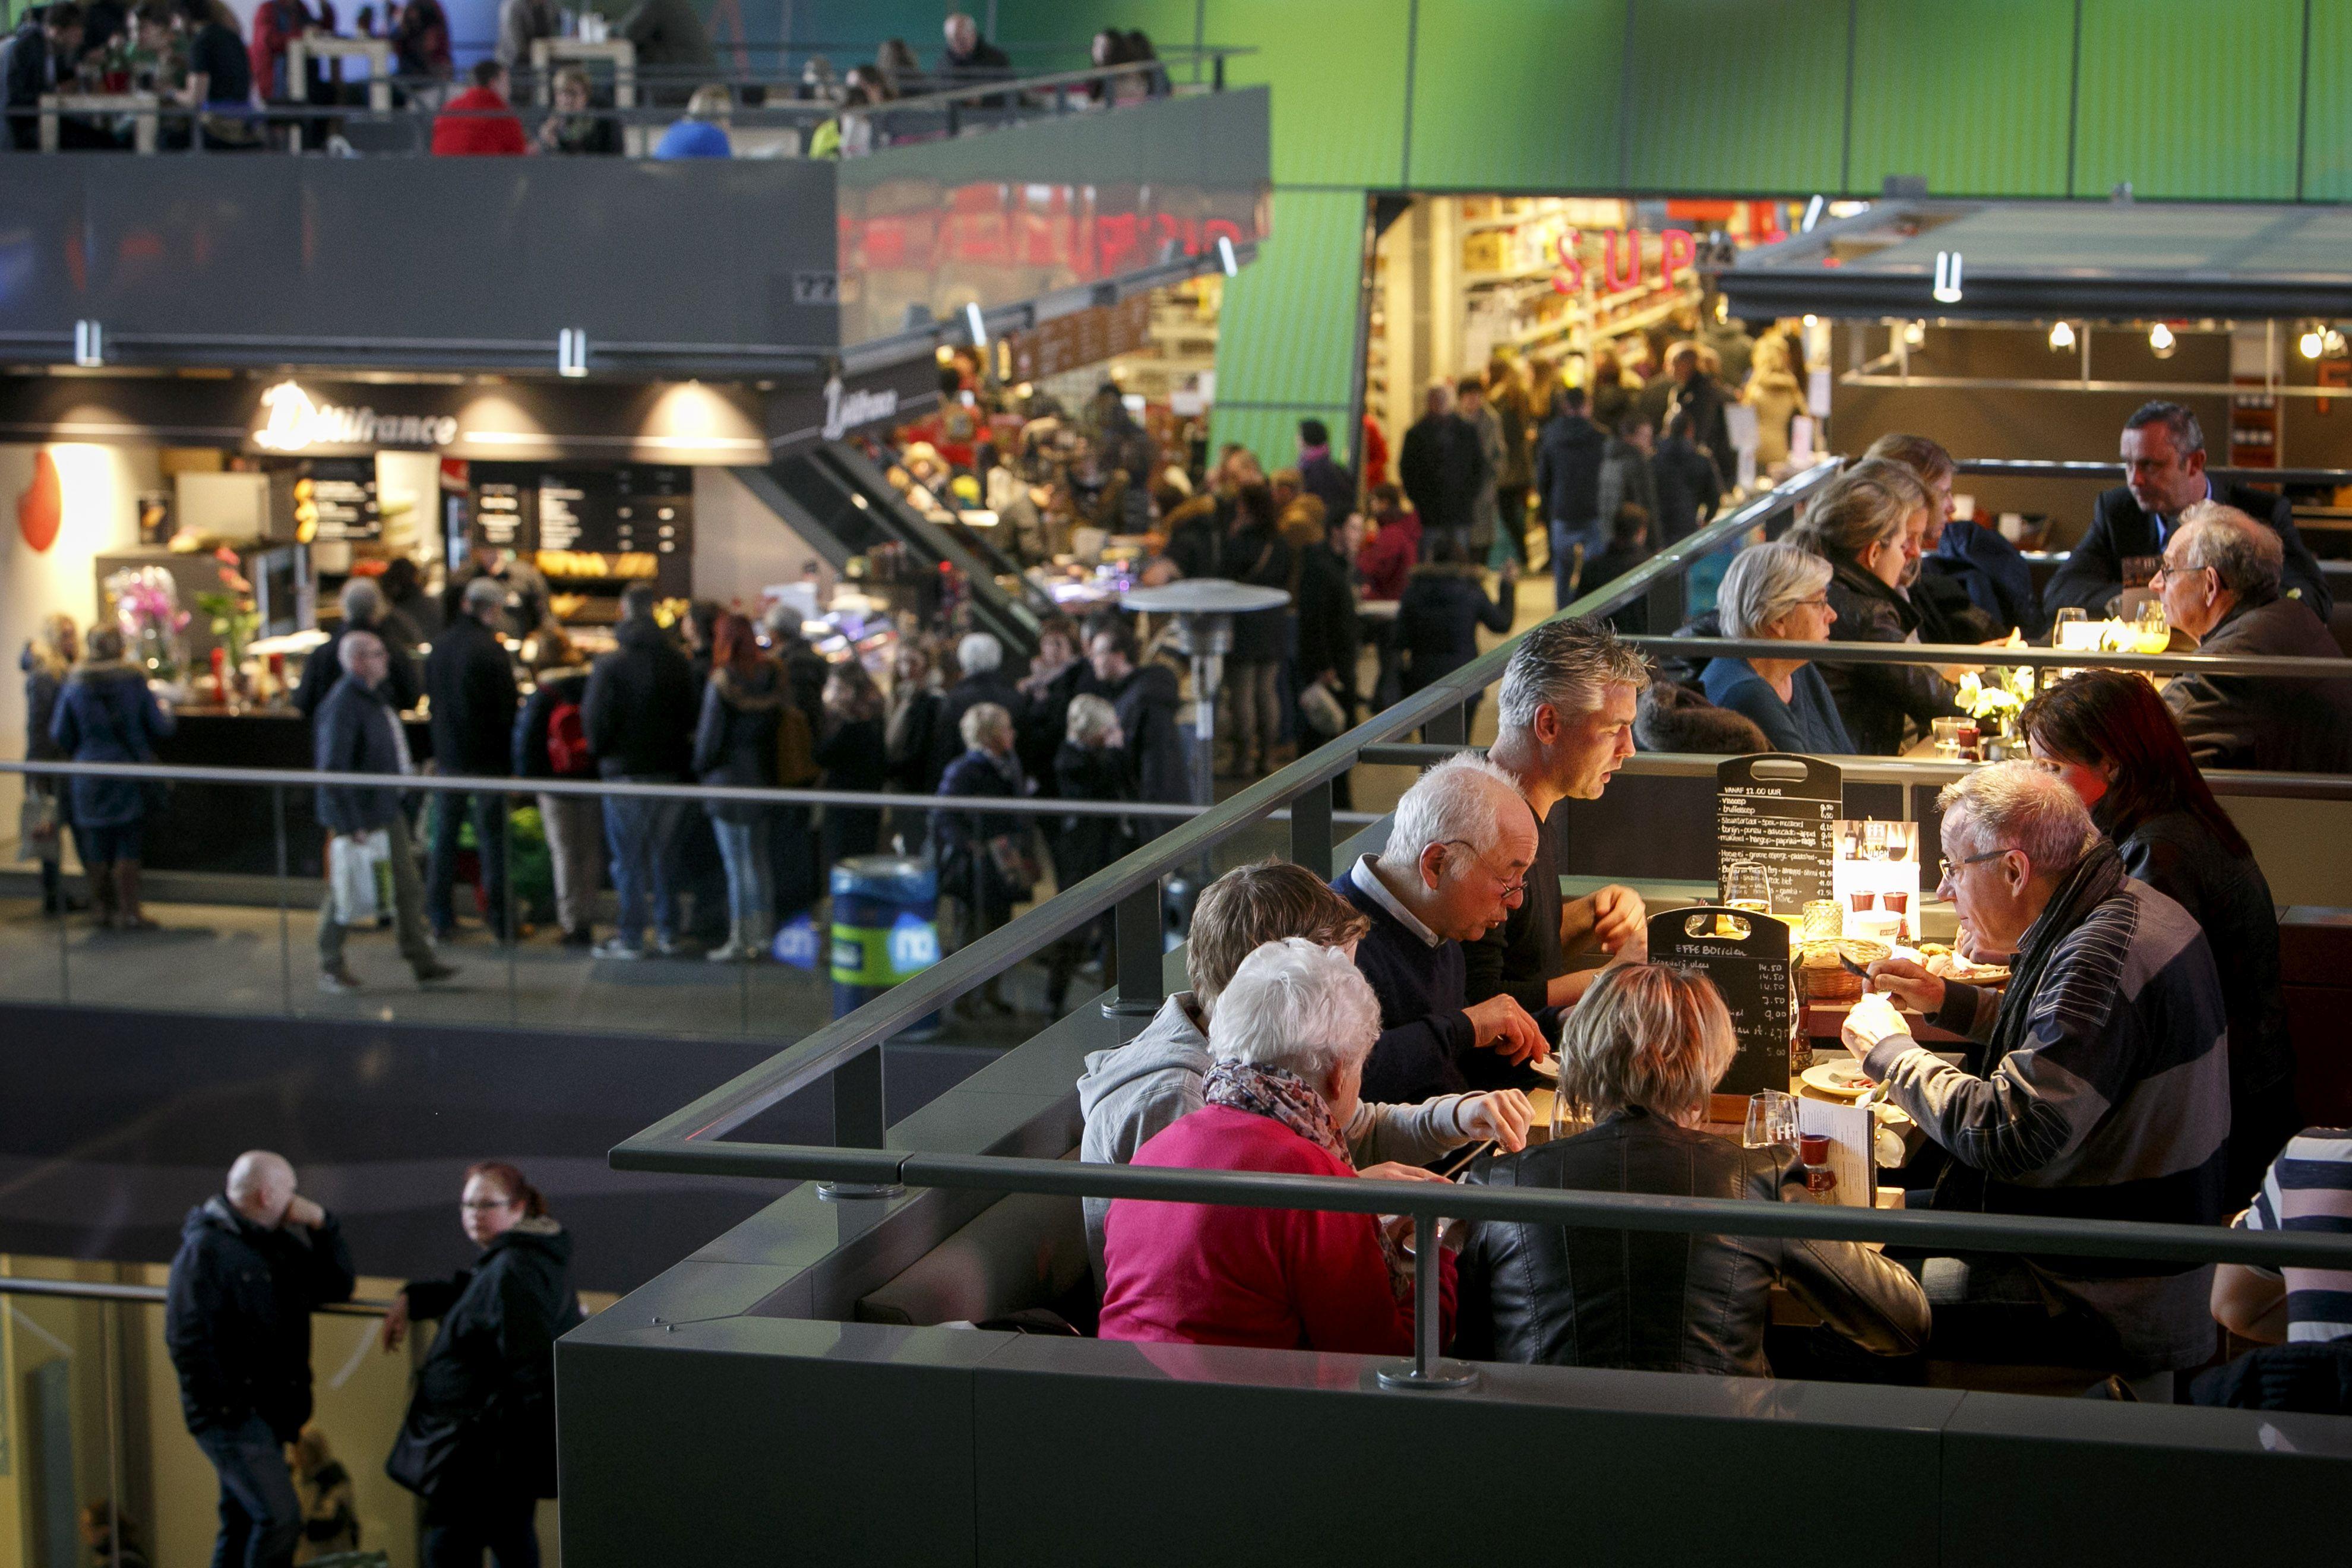 (C) Roel Dijkstra Fotografie / Foto Fred Libochant Rotterdam / eten en drinken in de Markthal